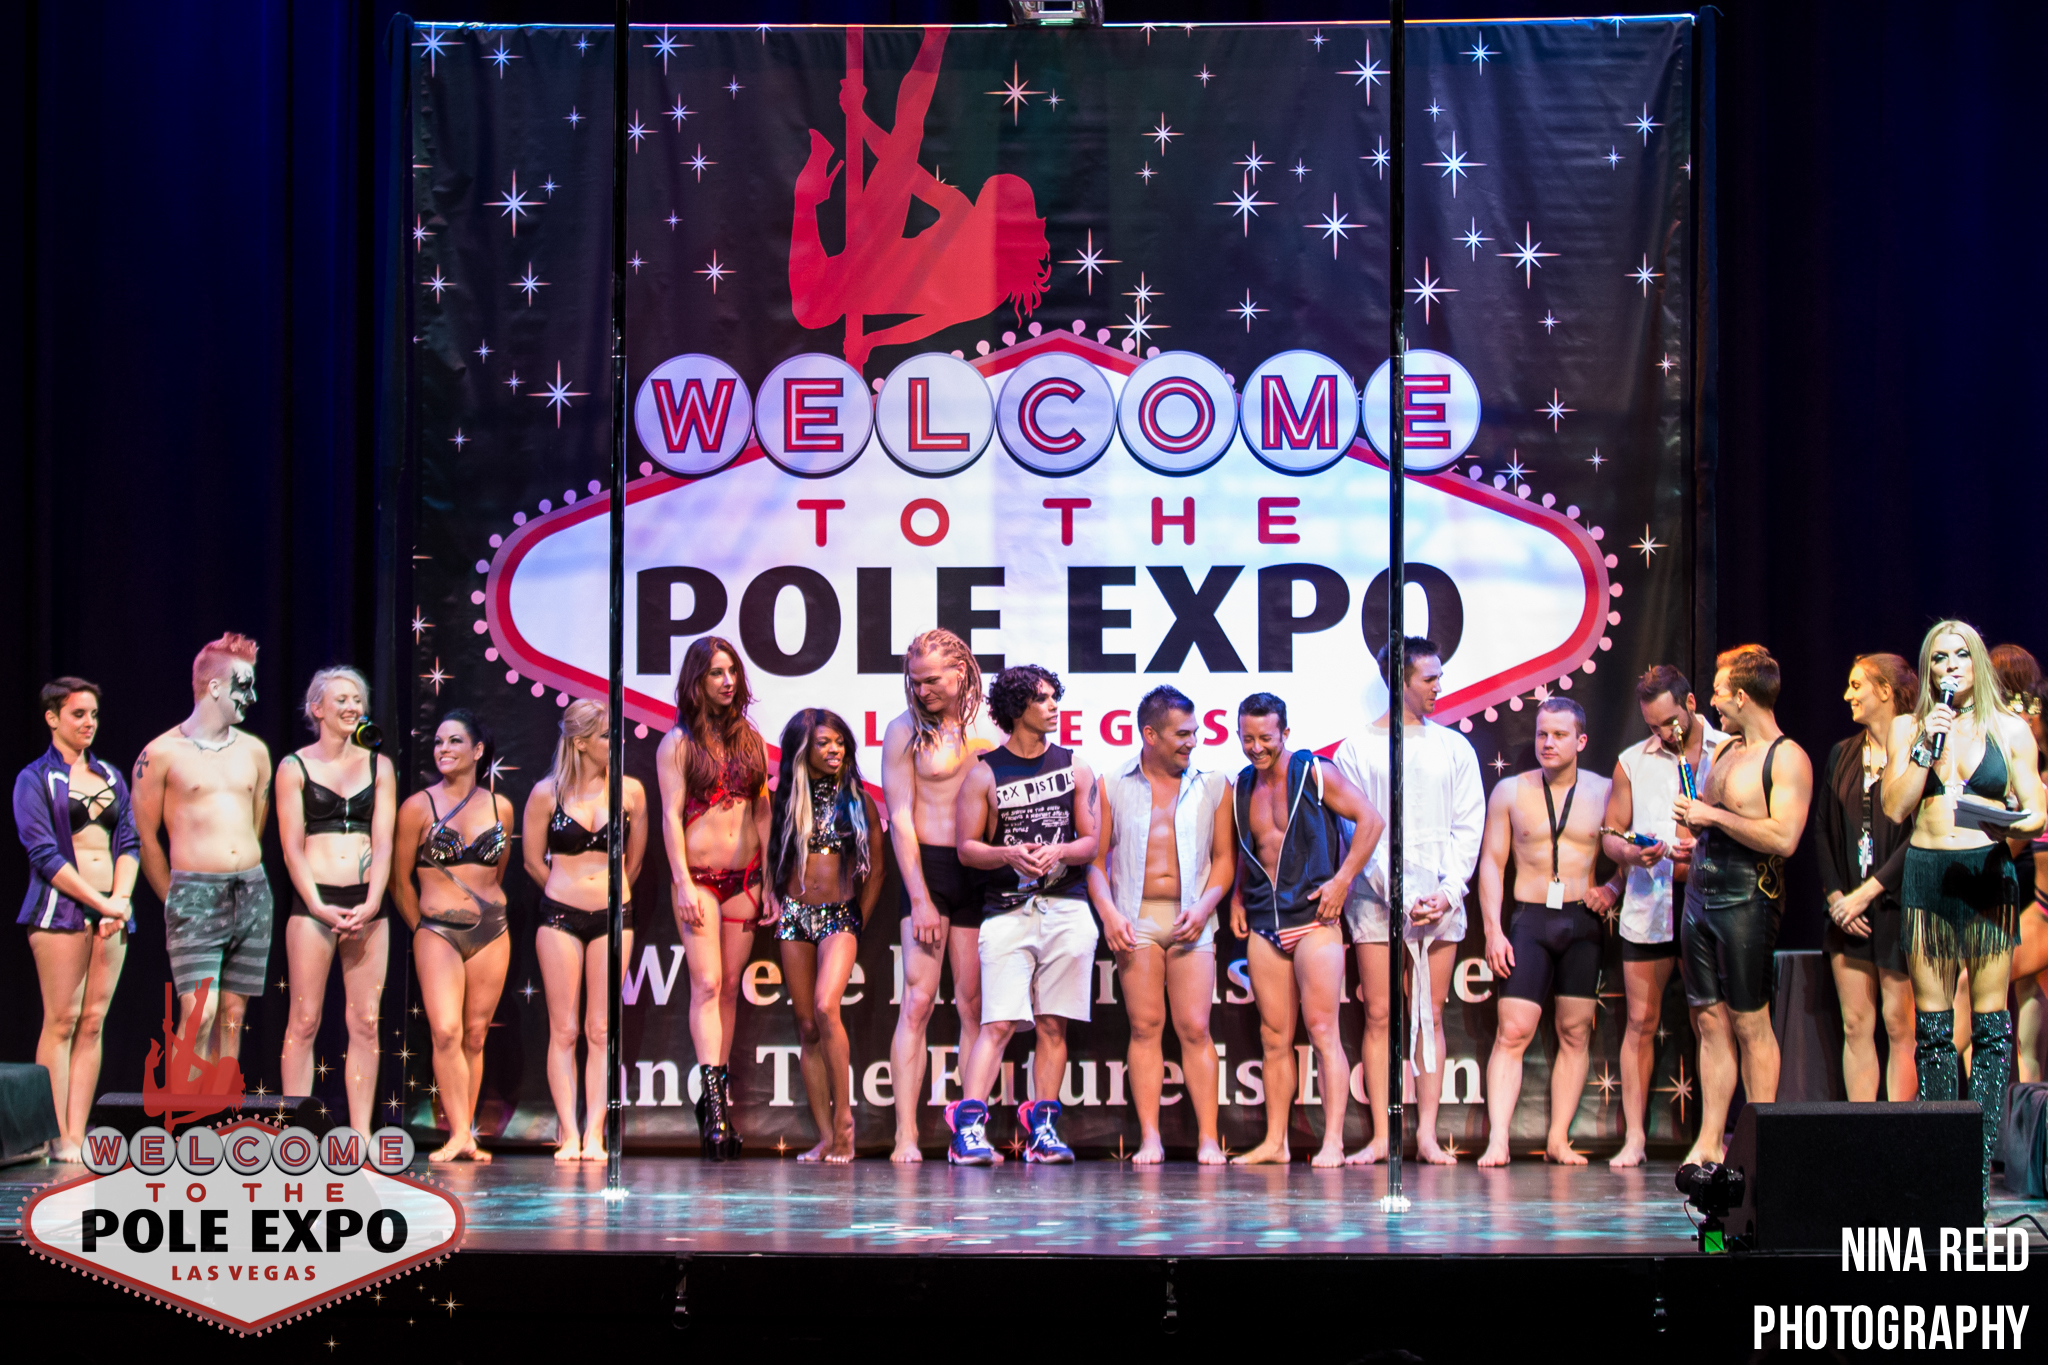 poleexpo-4120-3548290665-O.jpg